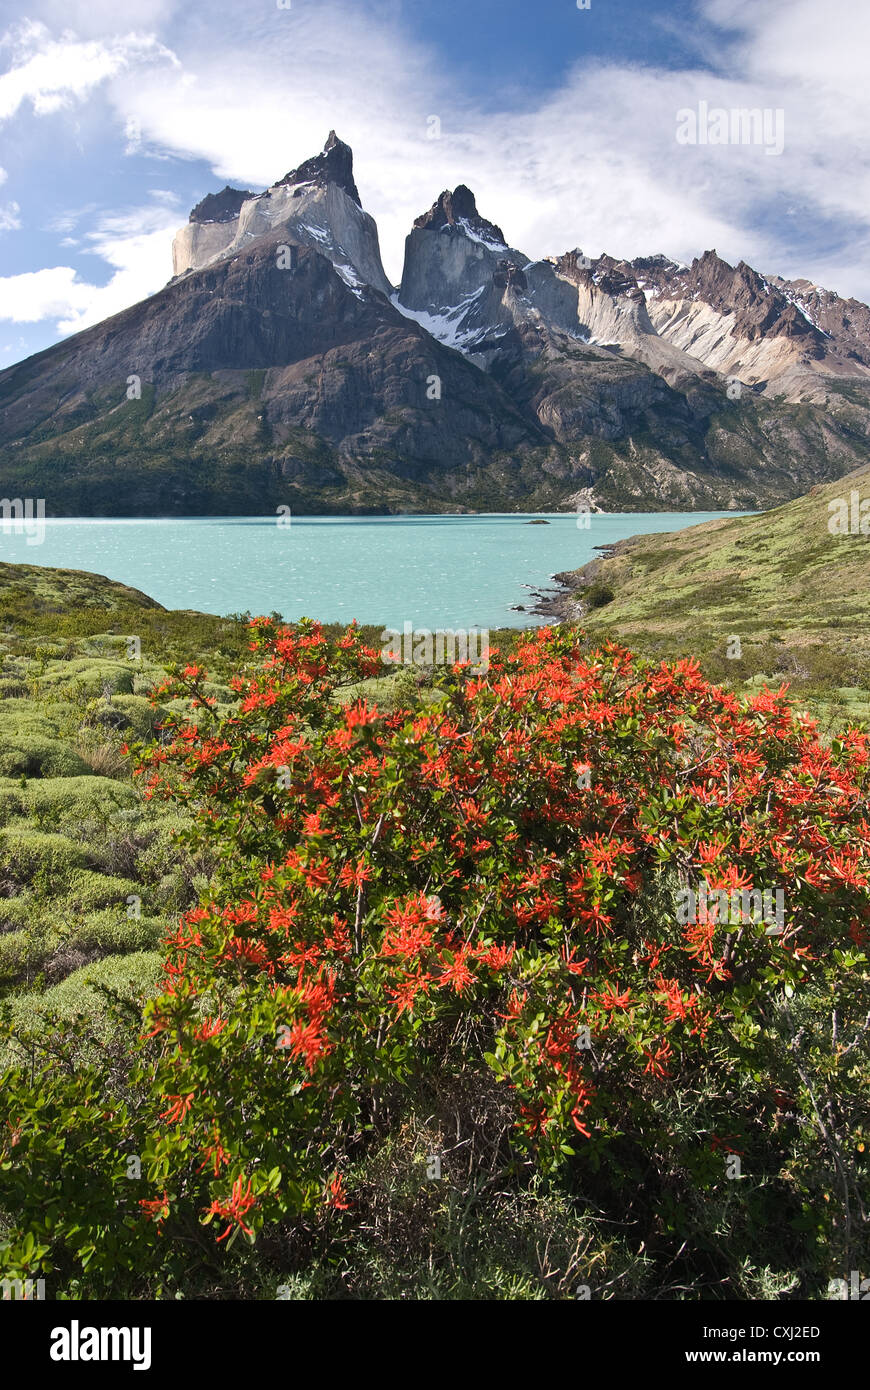 Elk198-4491v Chile, Patagonia, Torres del Paine NP, Lago Nordenskjold with Cuernos massif, Andes - Stock Image